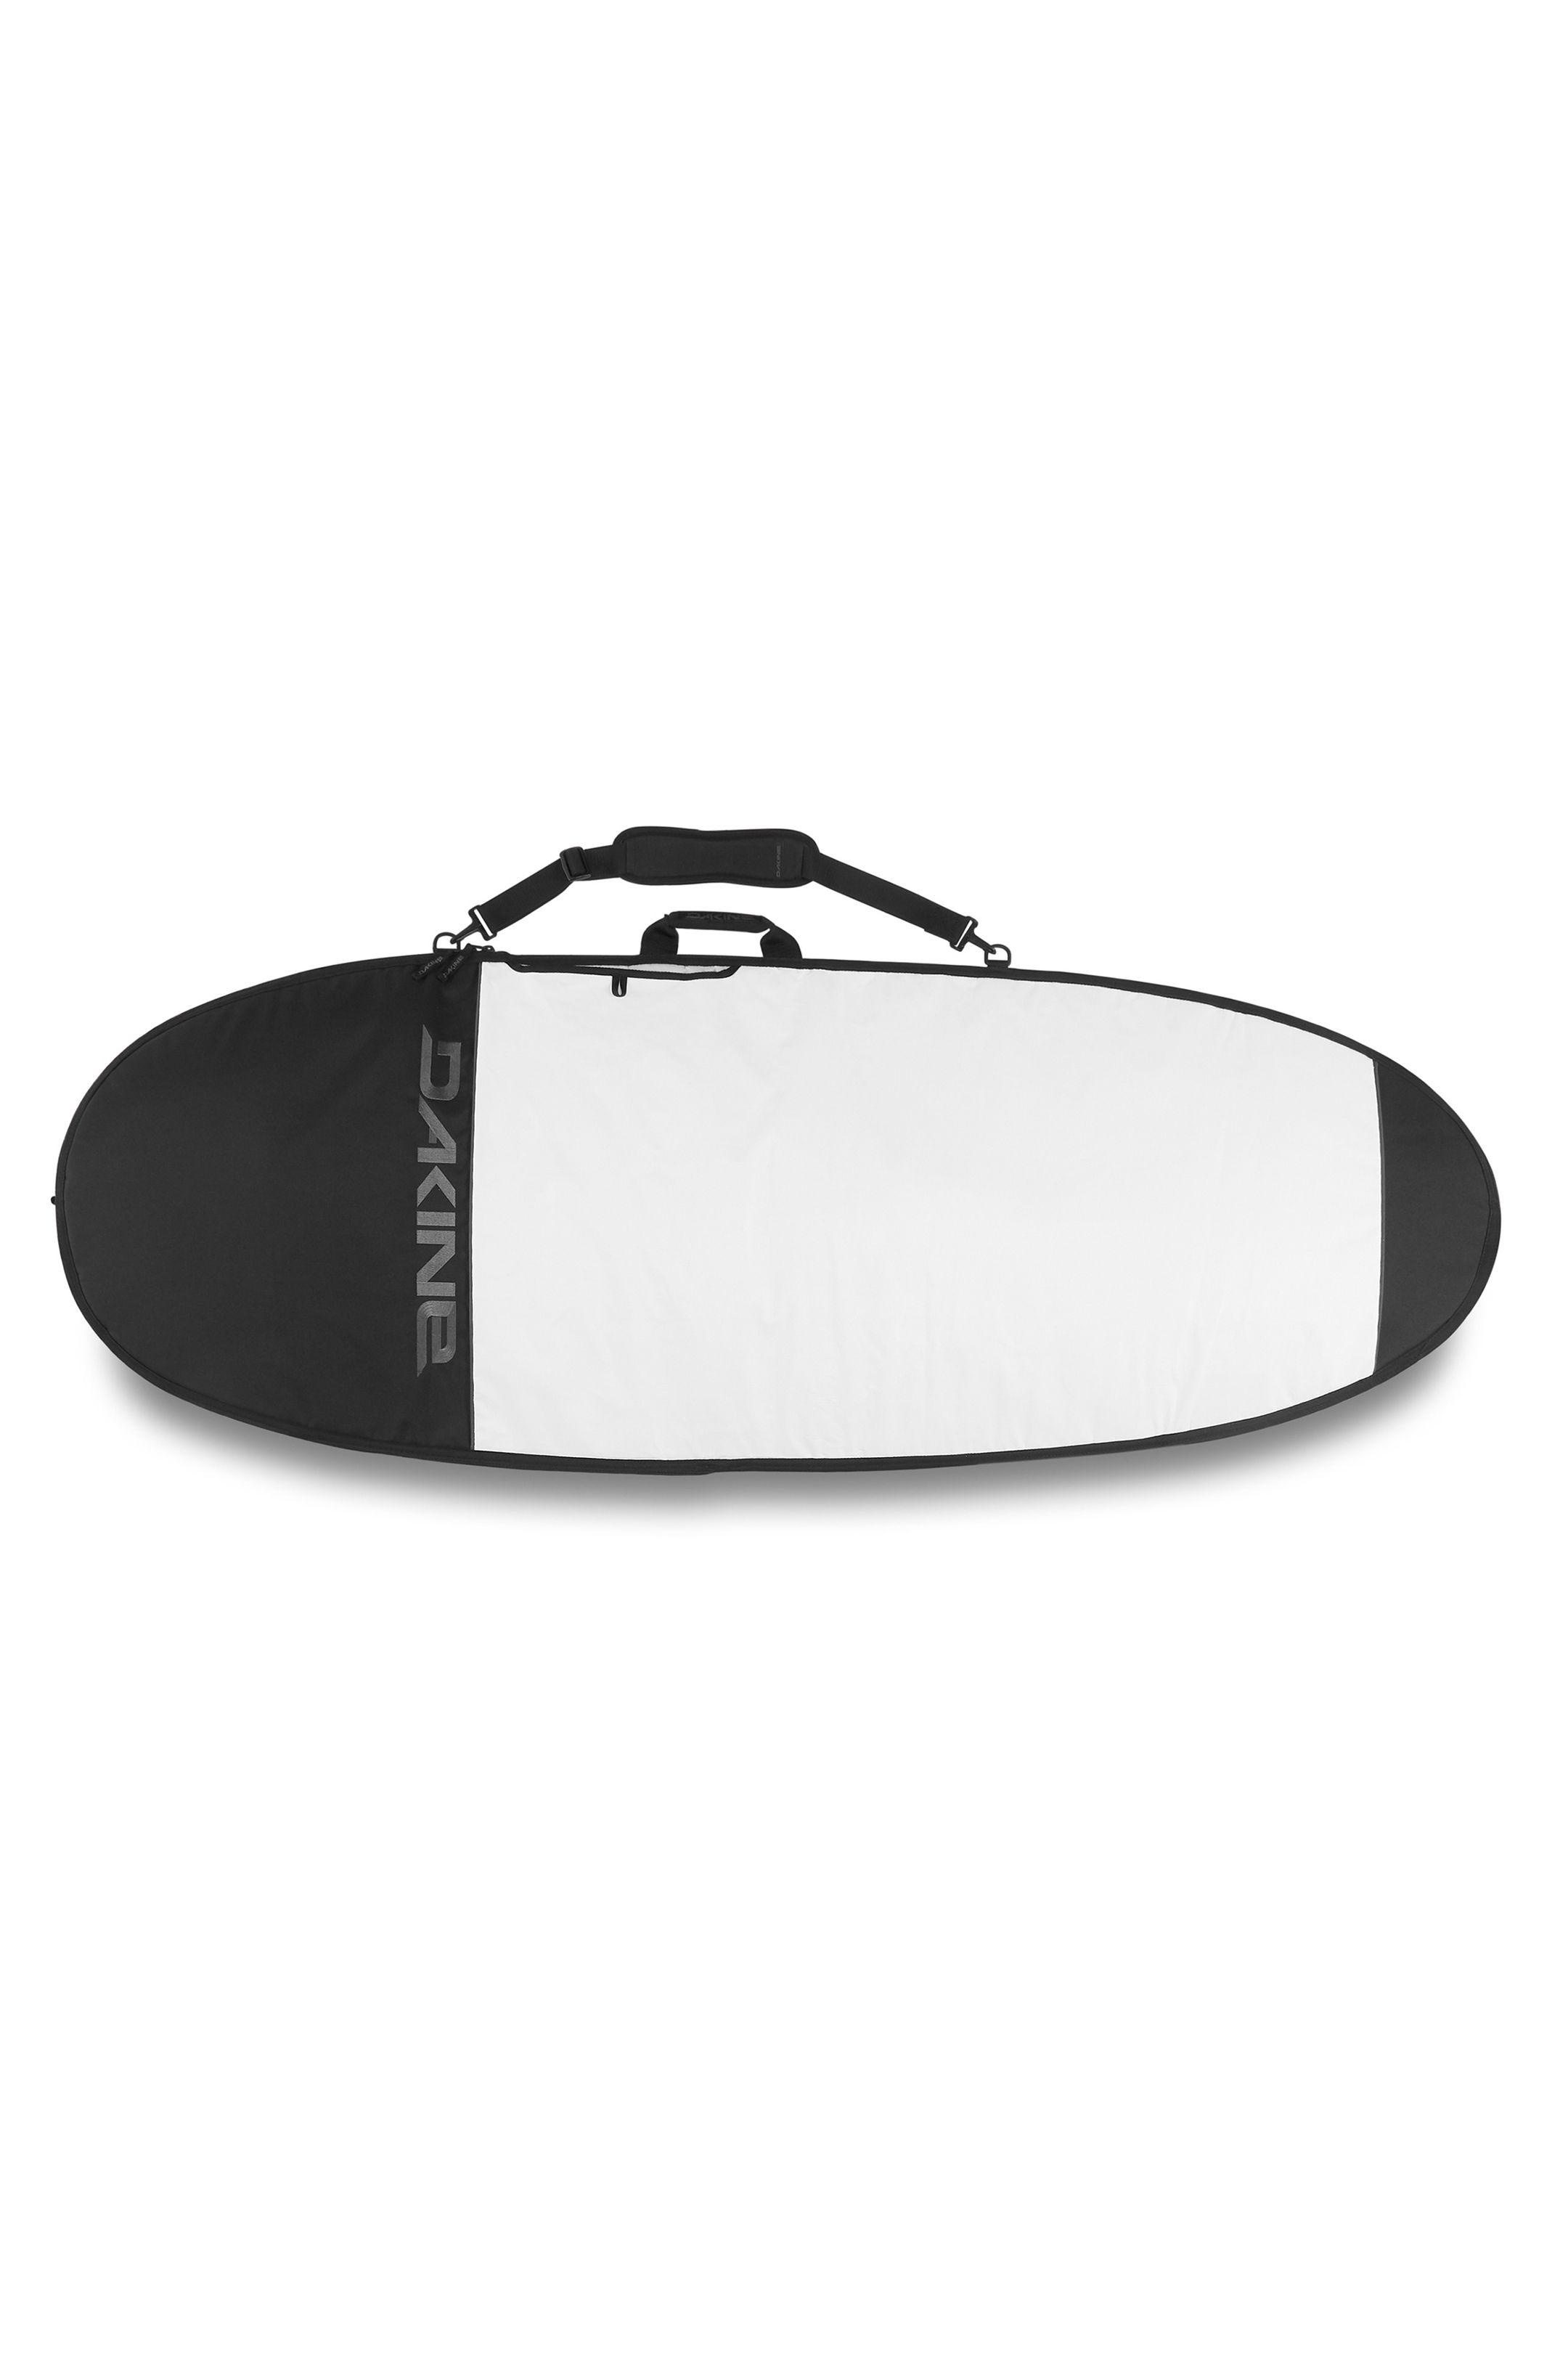 Dakine Boardbag 6'3 DAYLIGHT SURFBOARD BAG HYBRID White